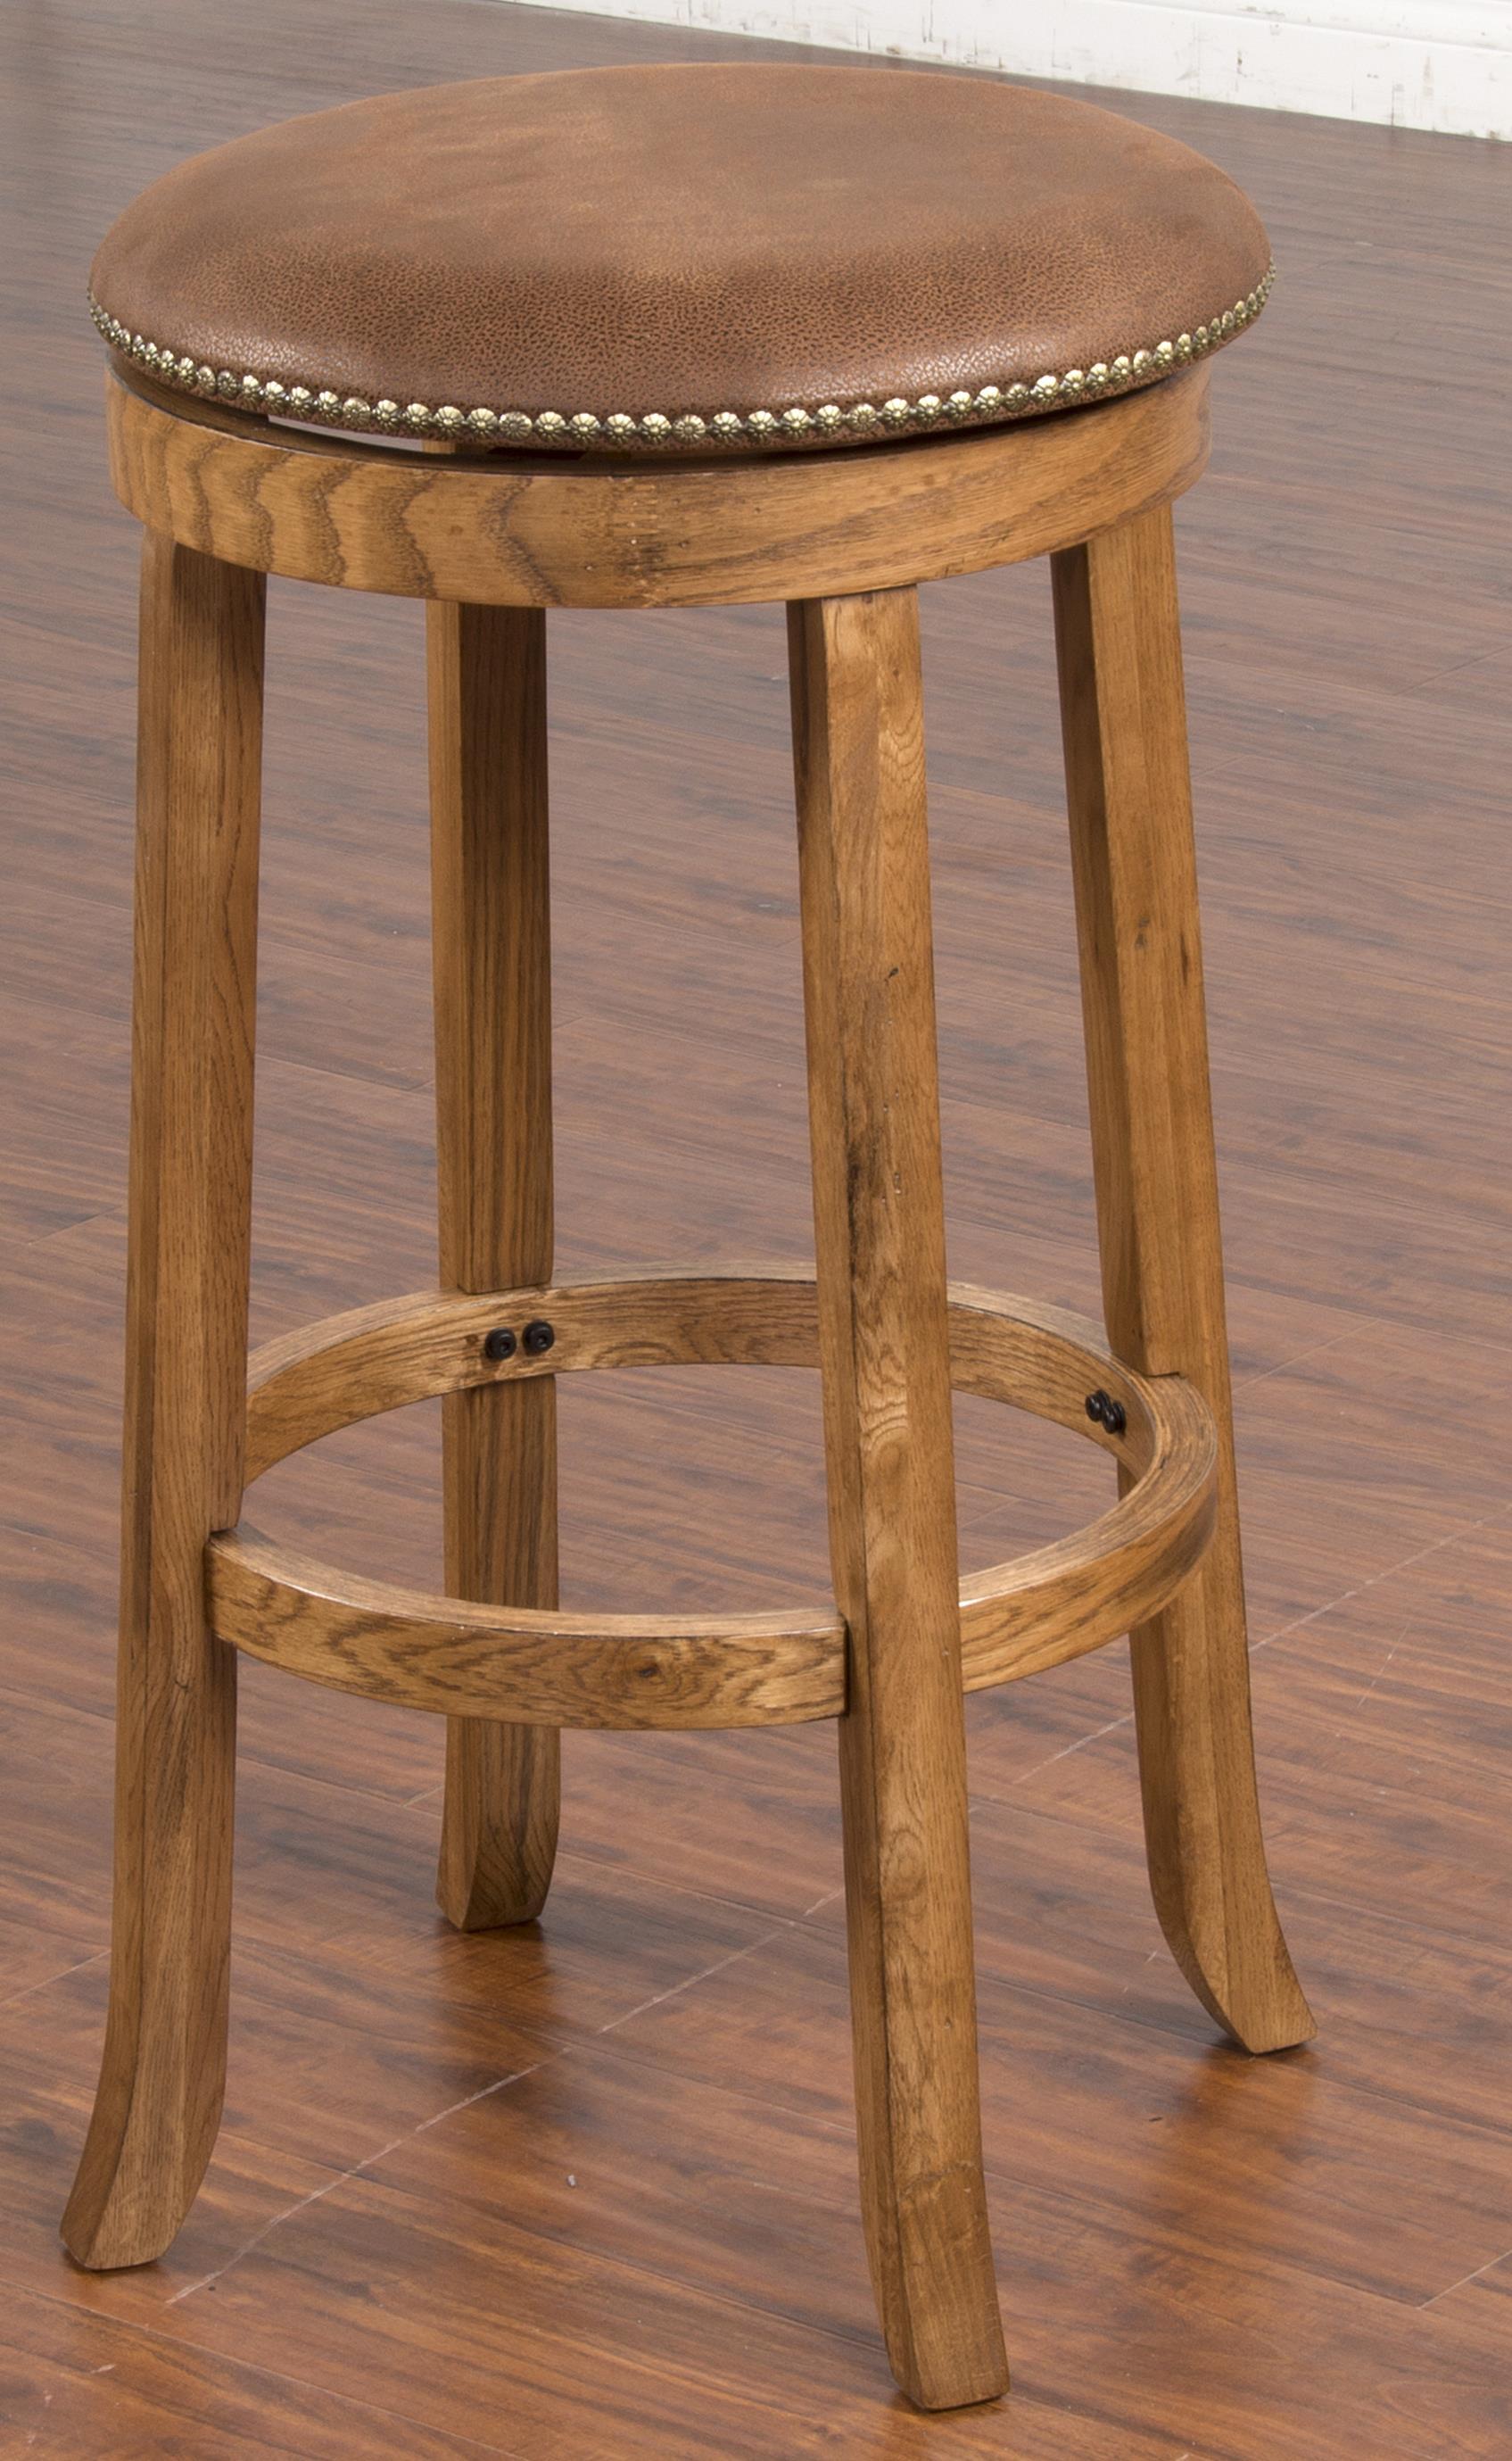 Sunny Designs Sedona Swivel Stool - Item Number: 1783RO